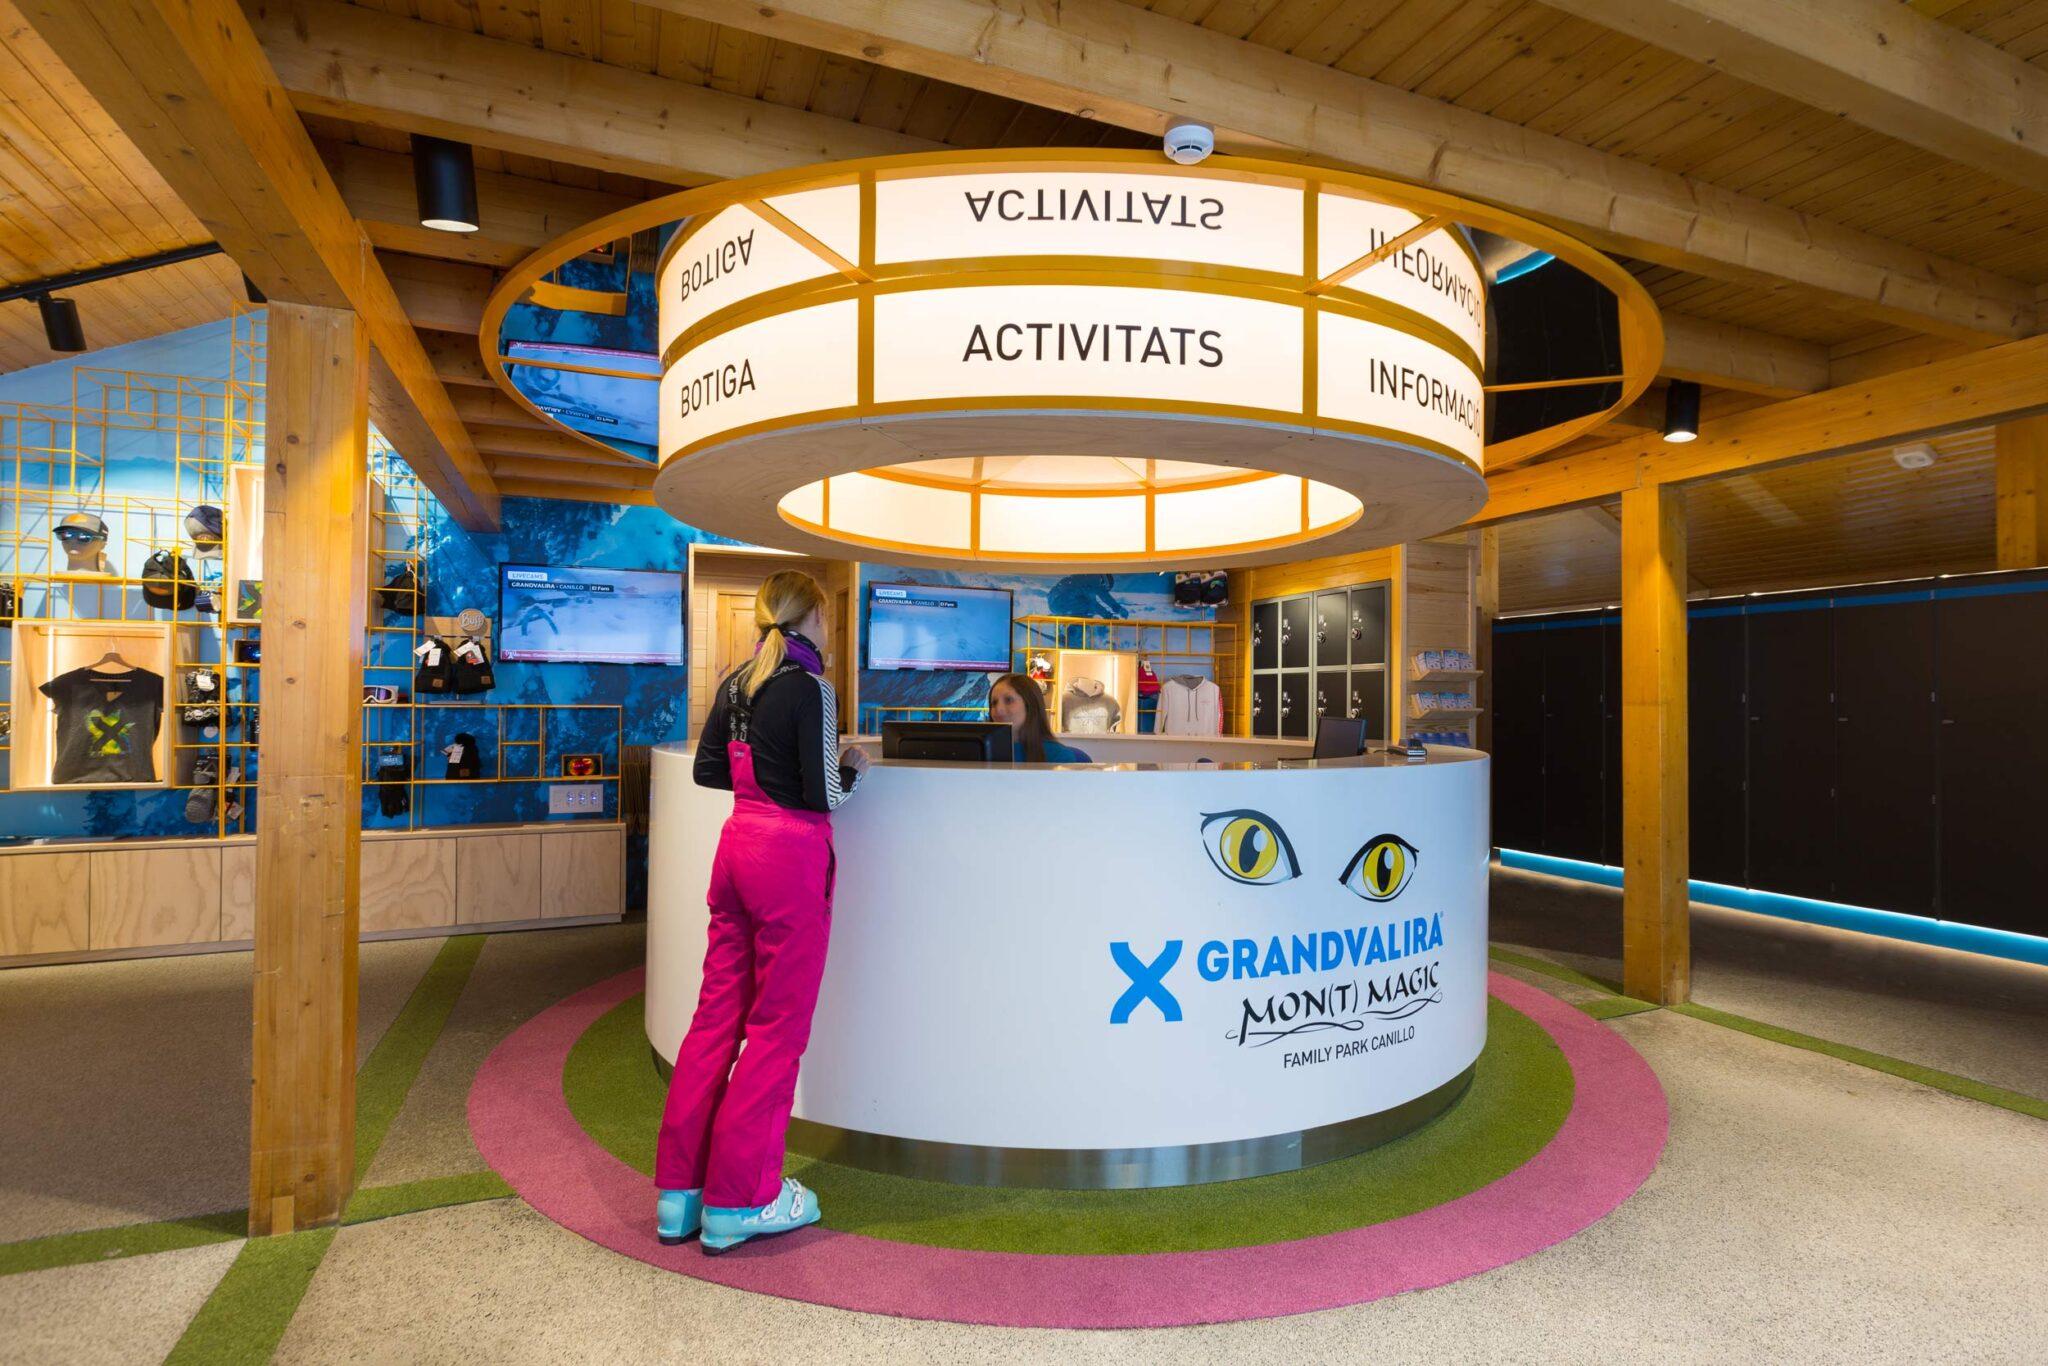 Reception Desk Botiga Forn Grandvalira, Andorra - Rosa Colet